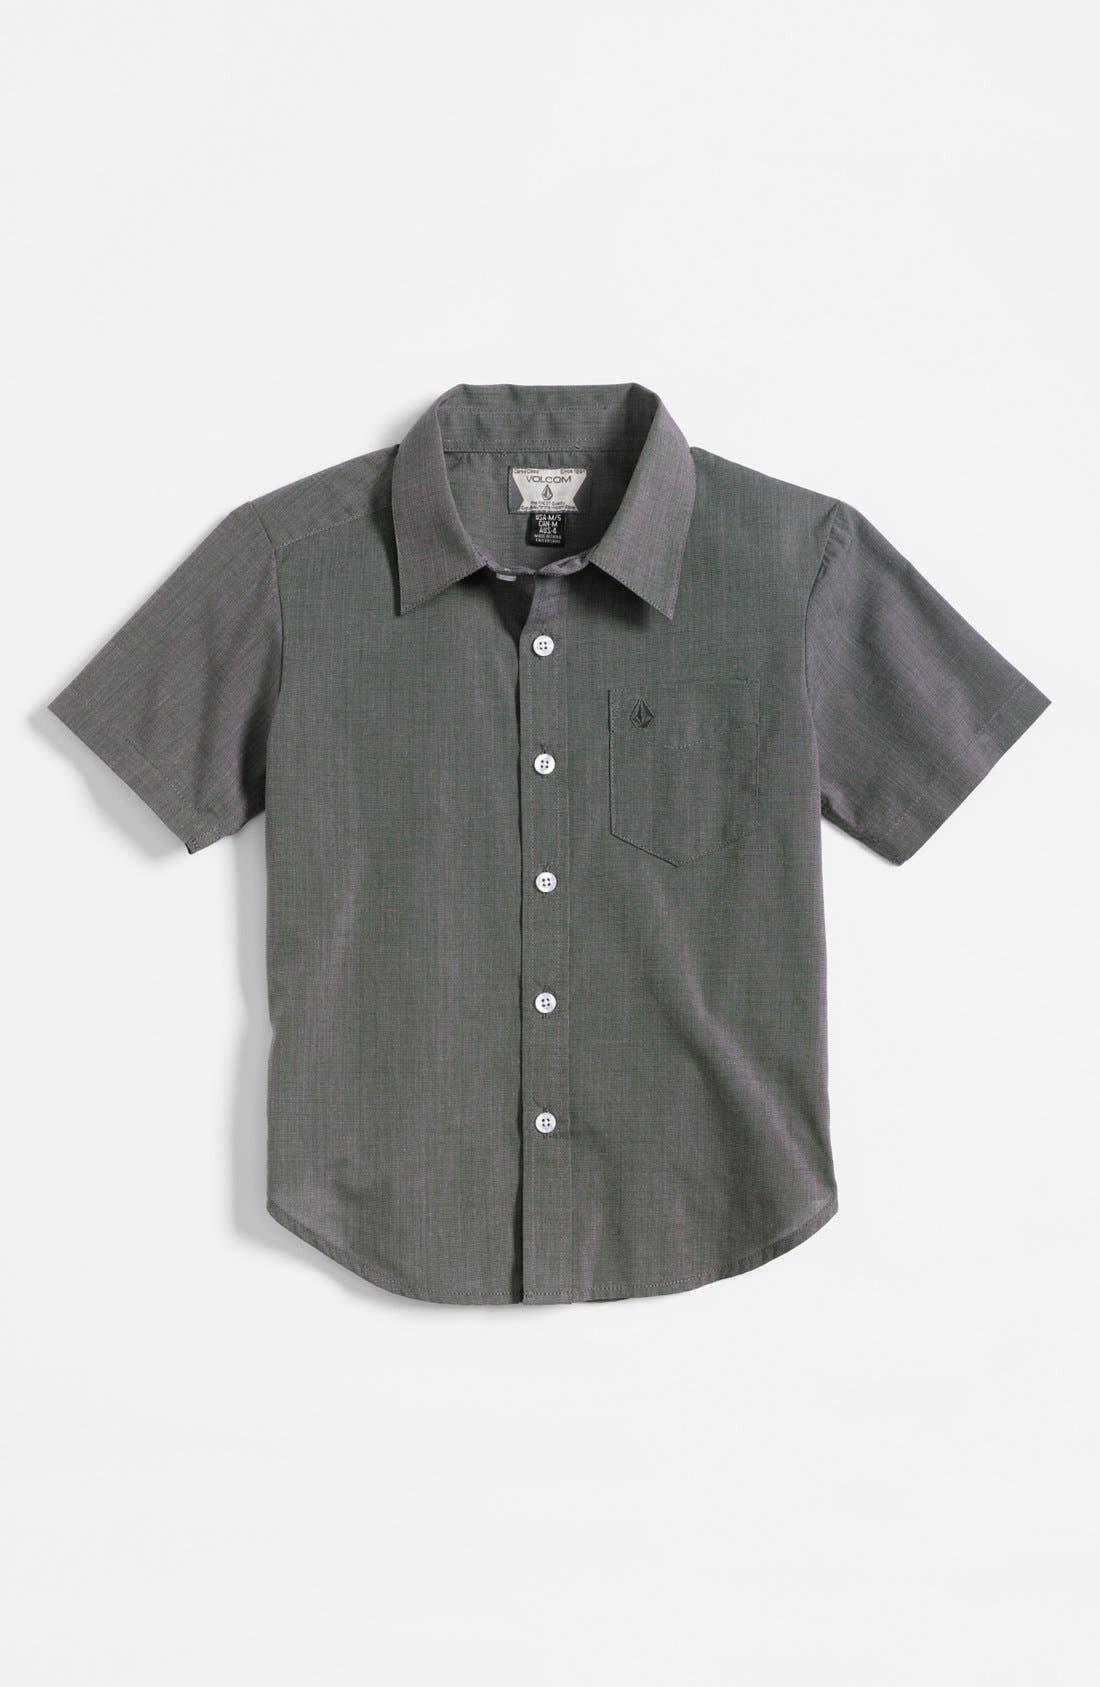 Alternate Image 1 Selected - Volcom 'Why Factor' Woven Shirt (Big Boys)